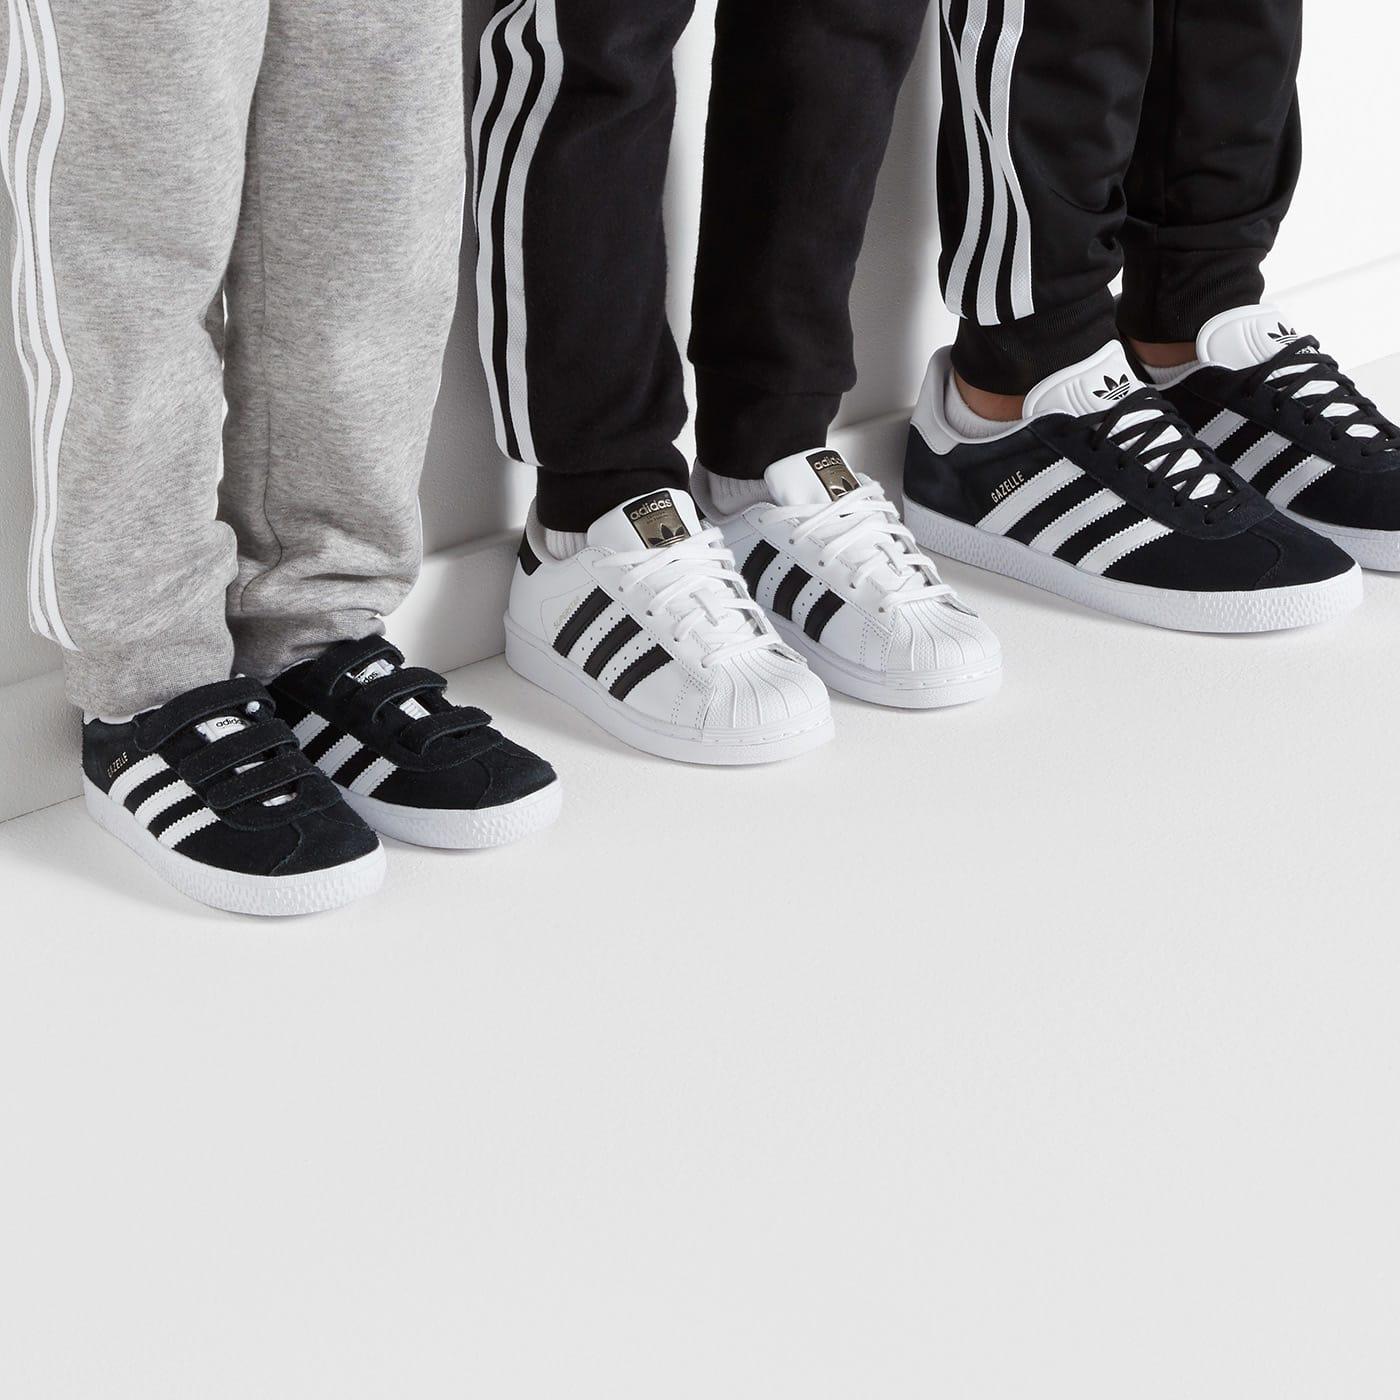 new arrival 84330 b4a81 Børnesko adidas officiel butik